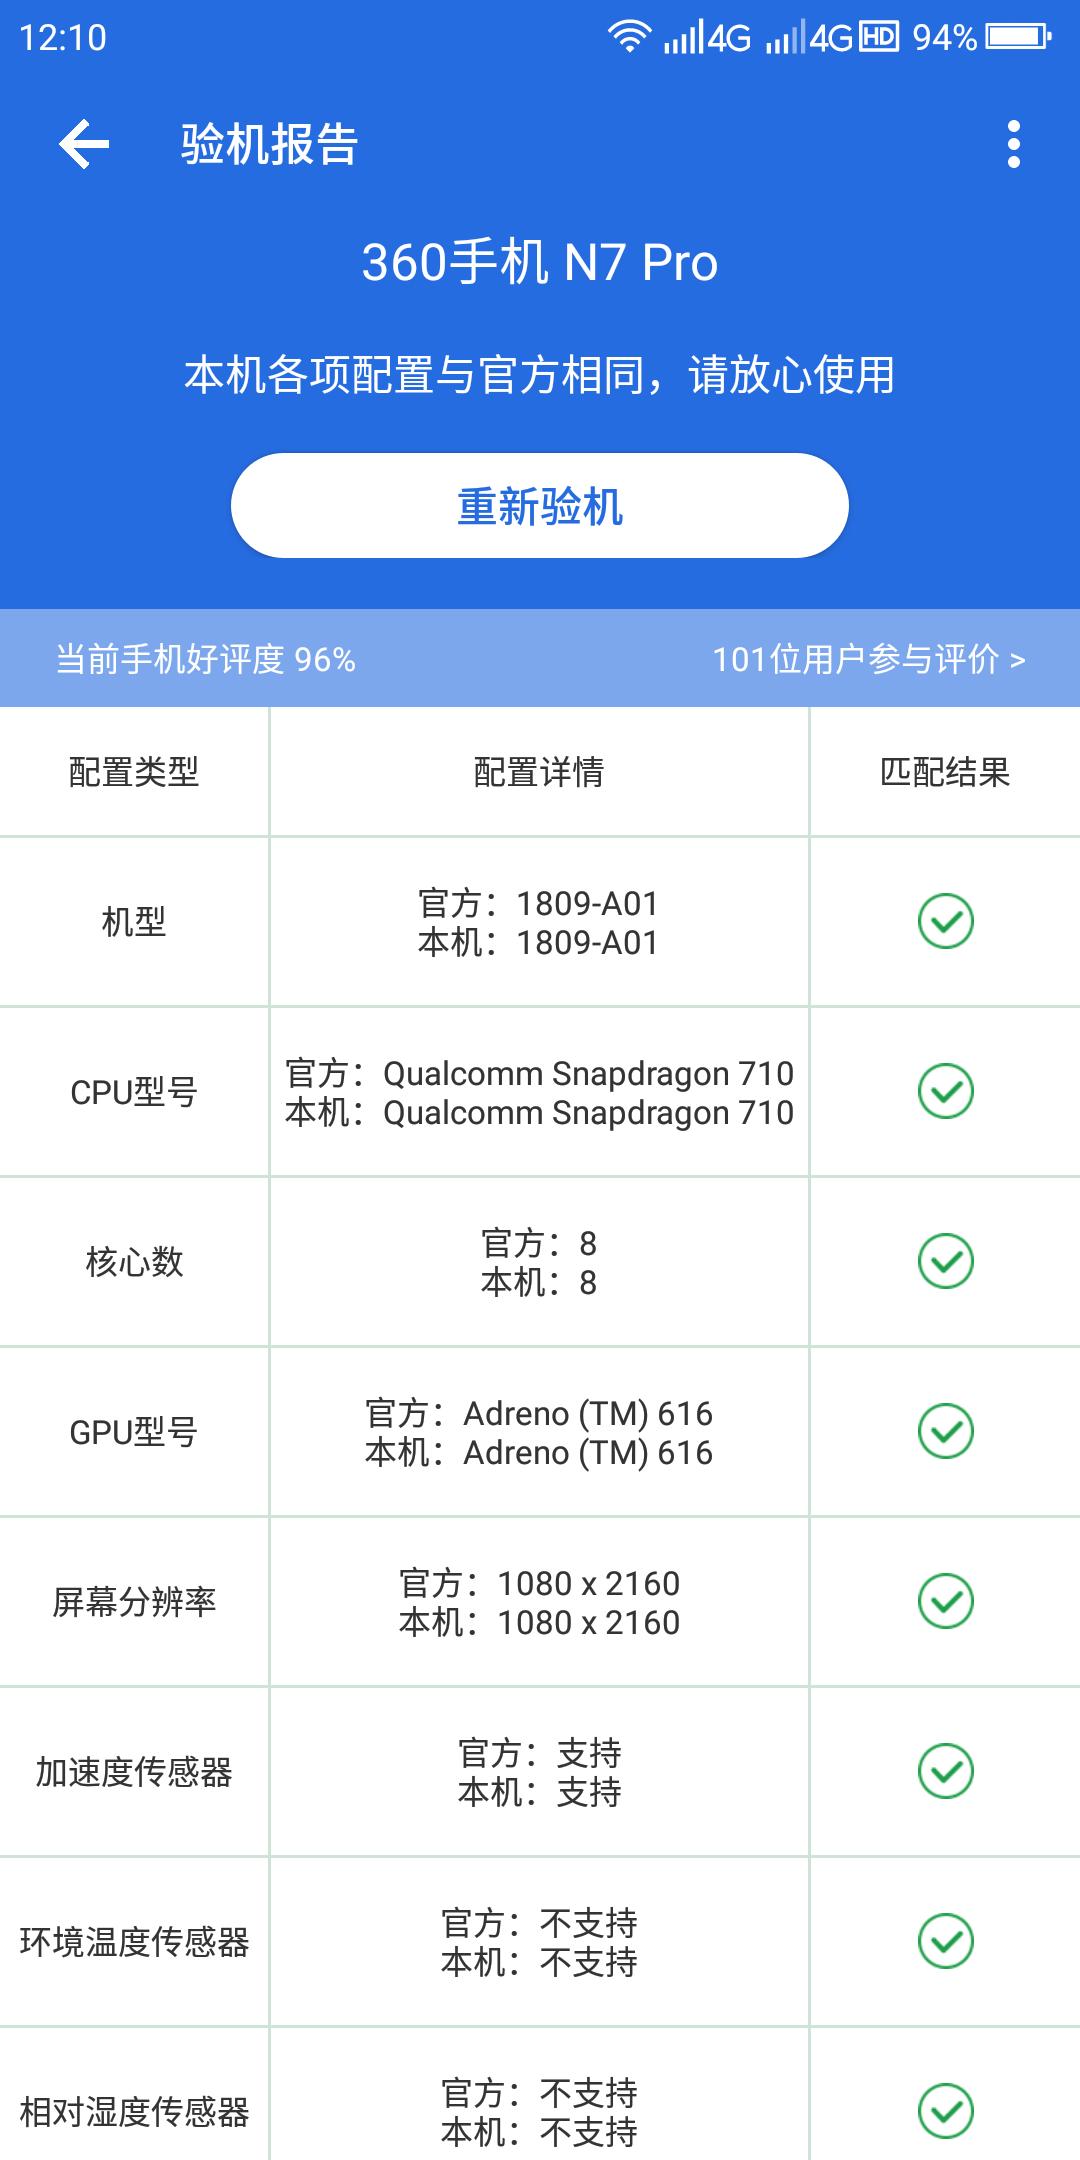 Screenshot_2018-12-10-12-10-38.png